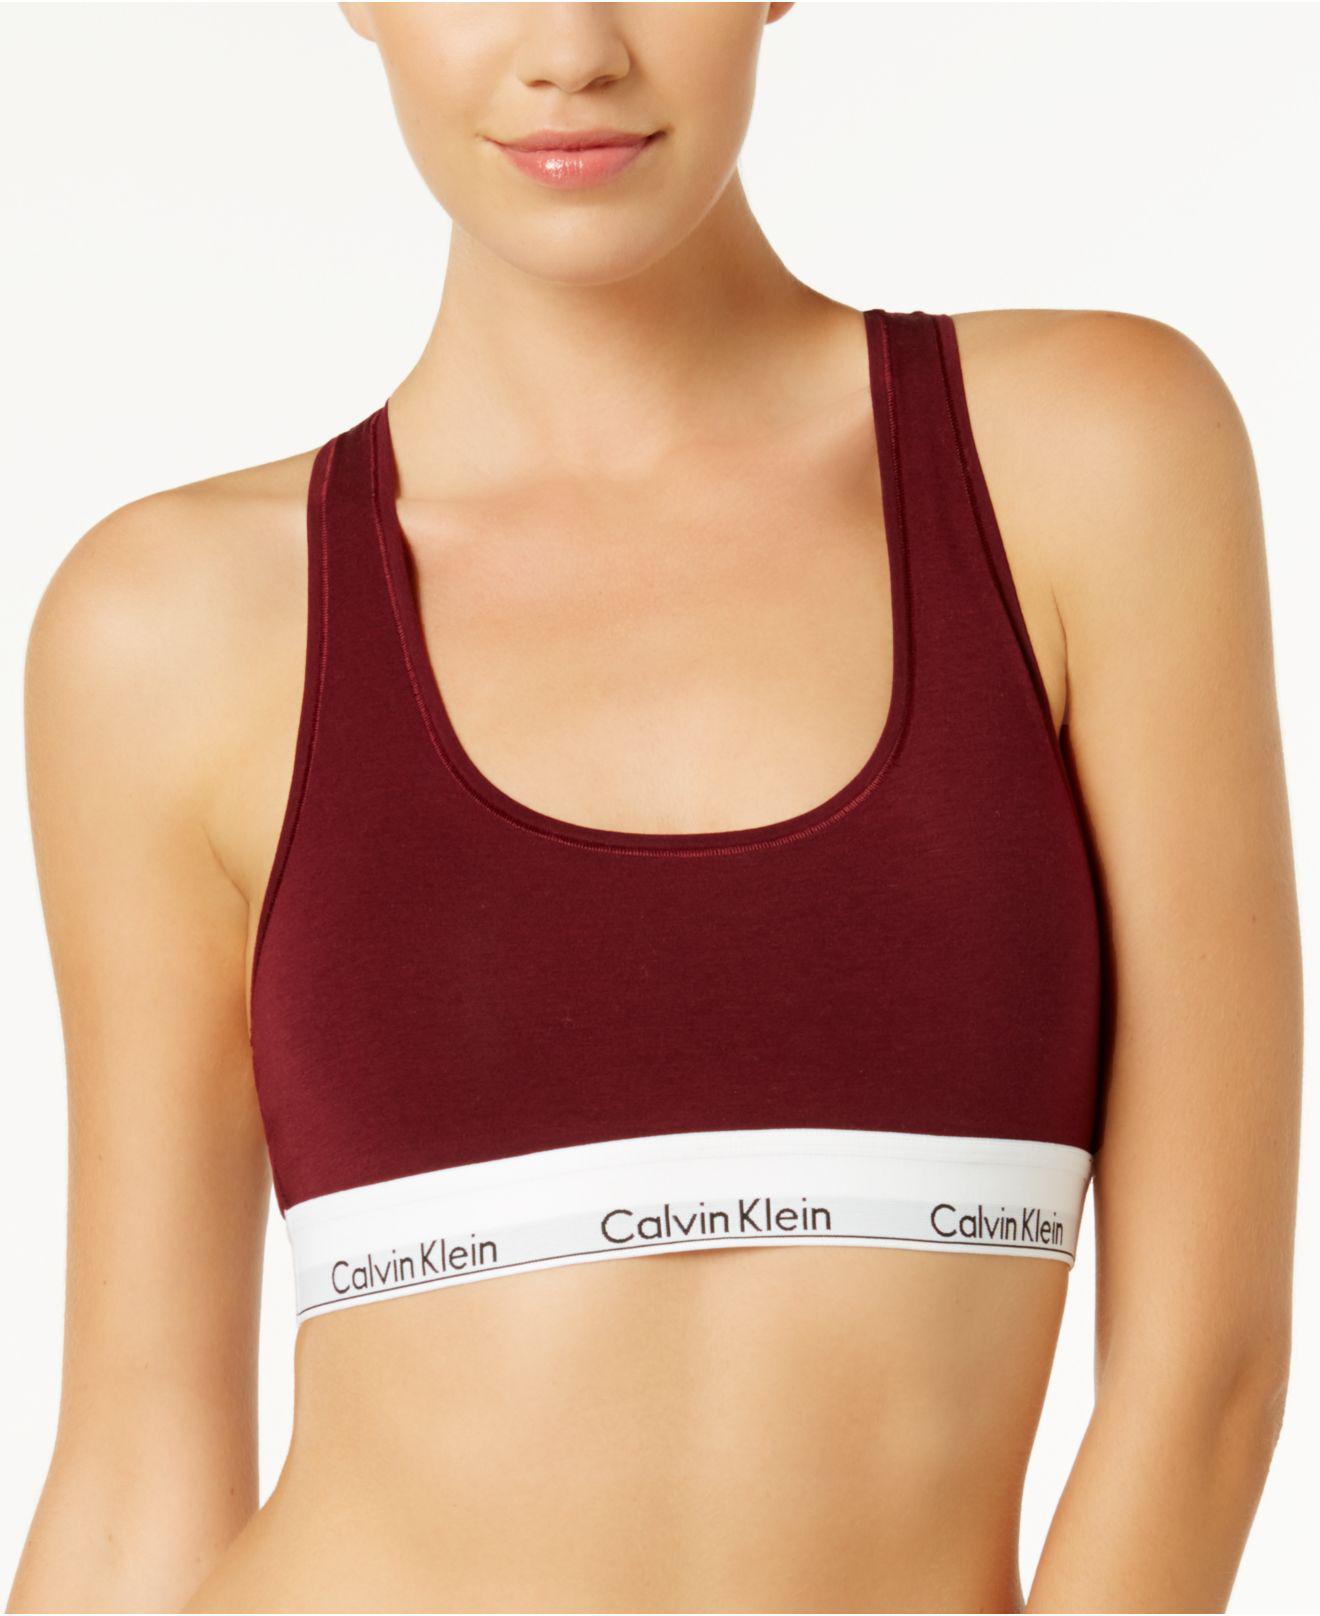 436b89e61e656 Lyst - Calvin Klein Modern Cotton Bralette F3785 in Red